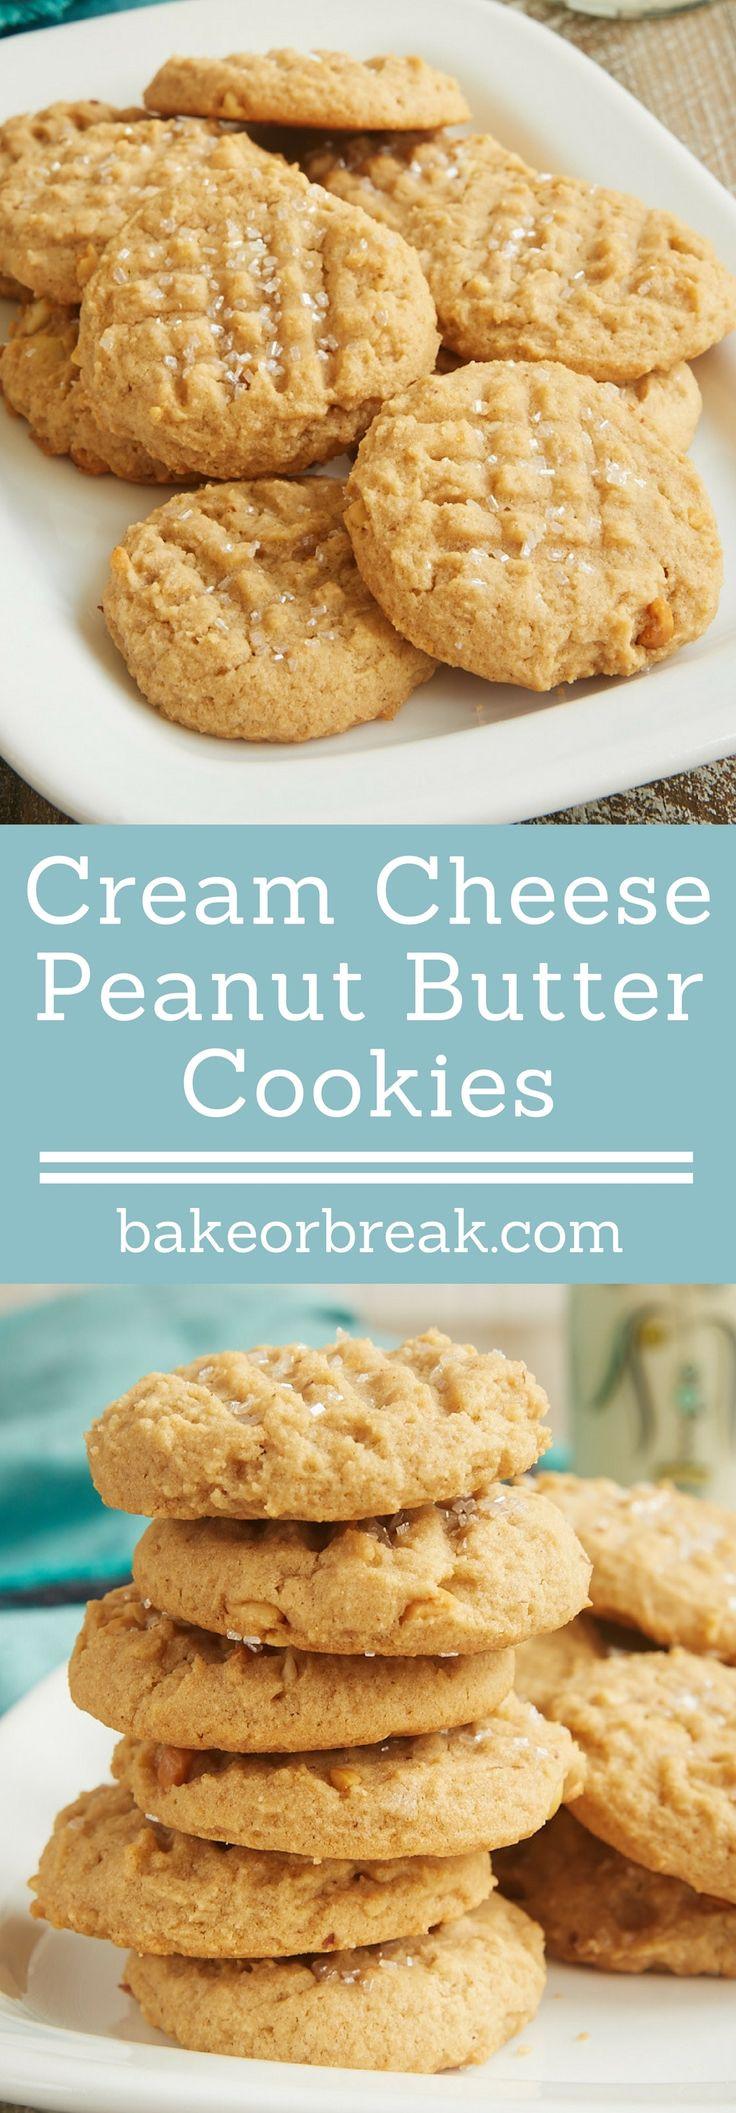 Keto Peanut Butter Cookies Cream Cheese  Cream Cheese Peanut Butter Cookies Recipe